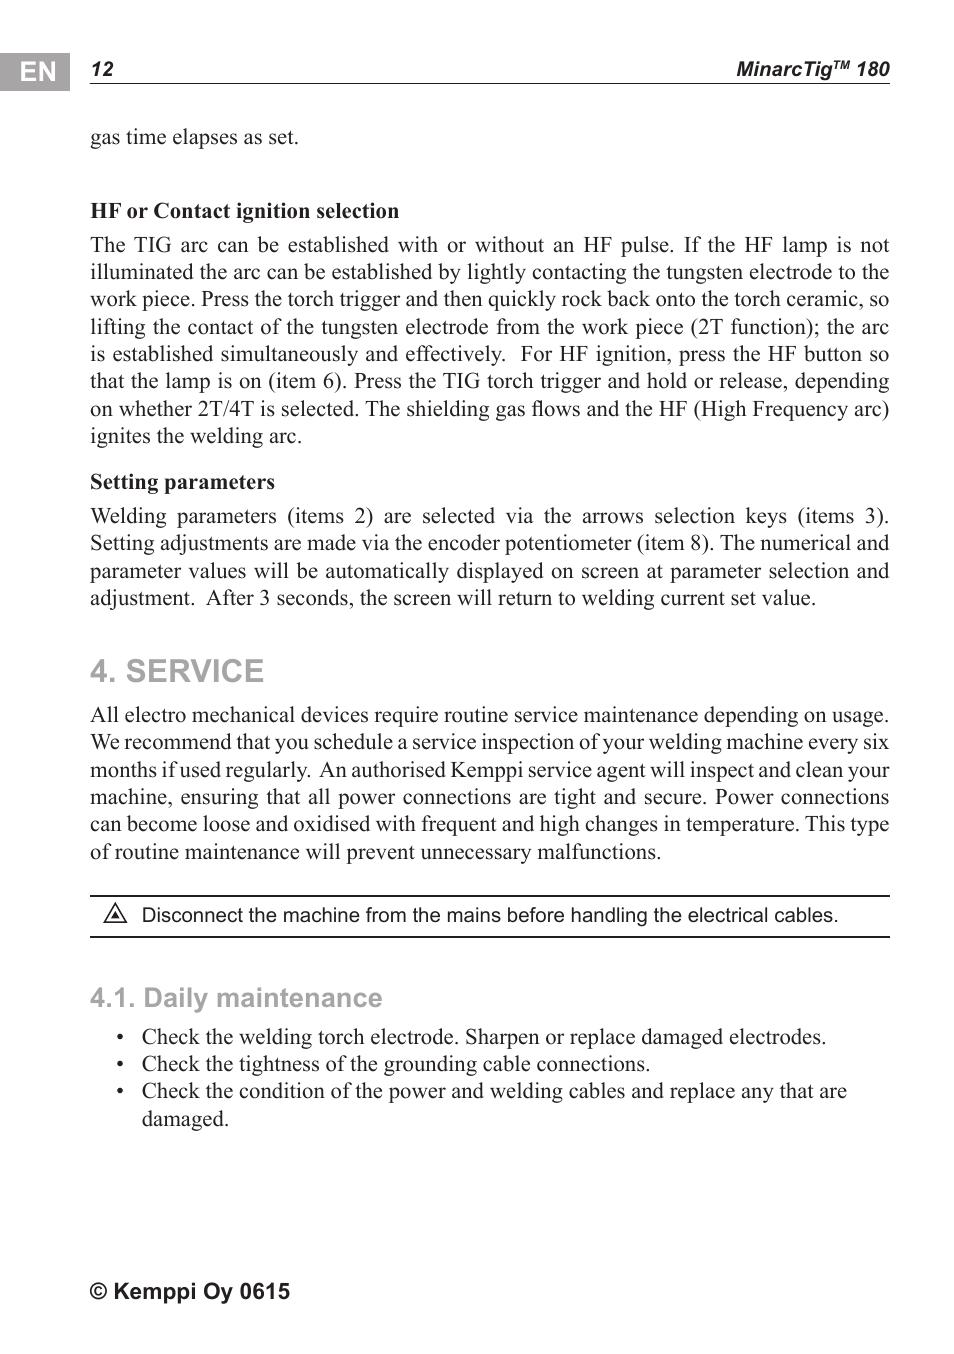 Service, Daily maintenance | Kemppi MinarcTig 180 User Manual | Page 13 / 18